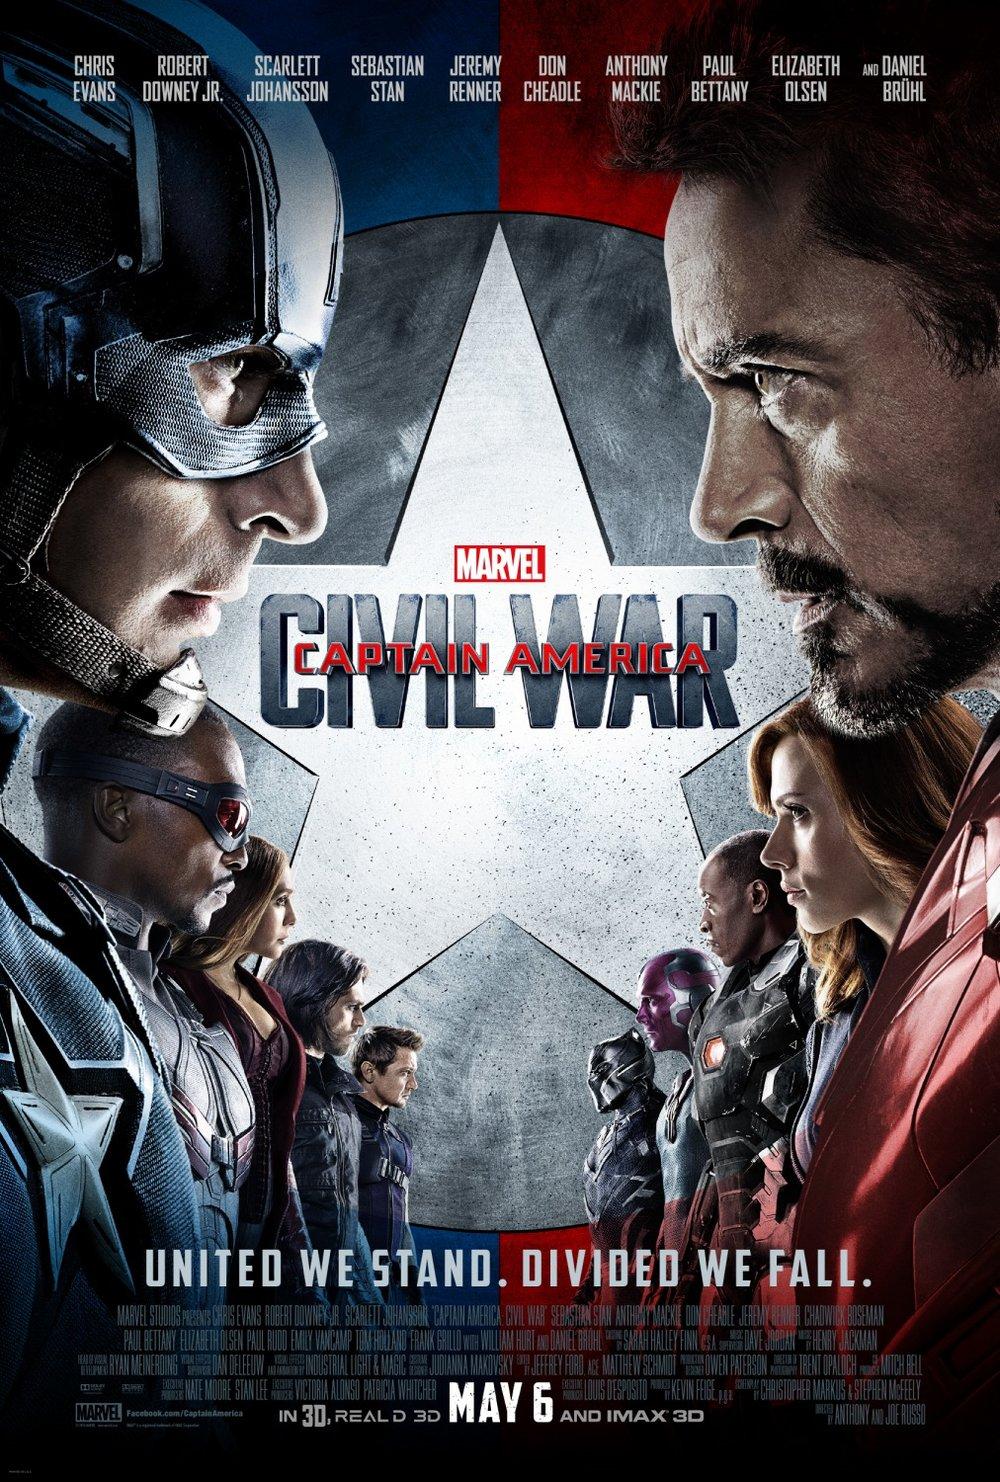 captain-america-3-movie-poster-marvel-cinematic-universe-1038906.jpg